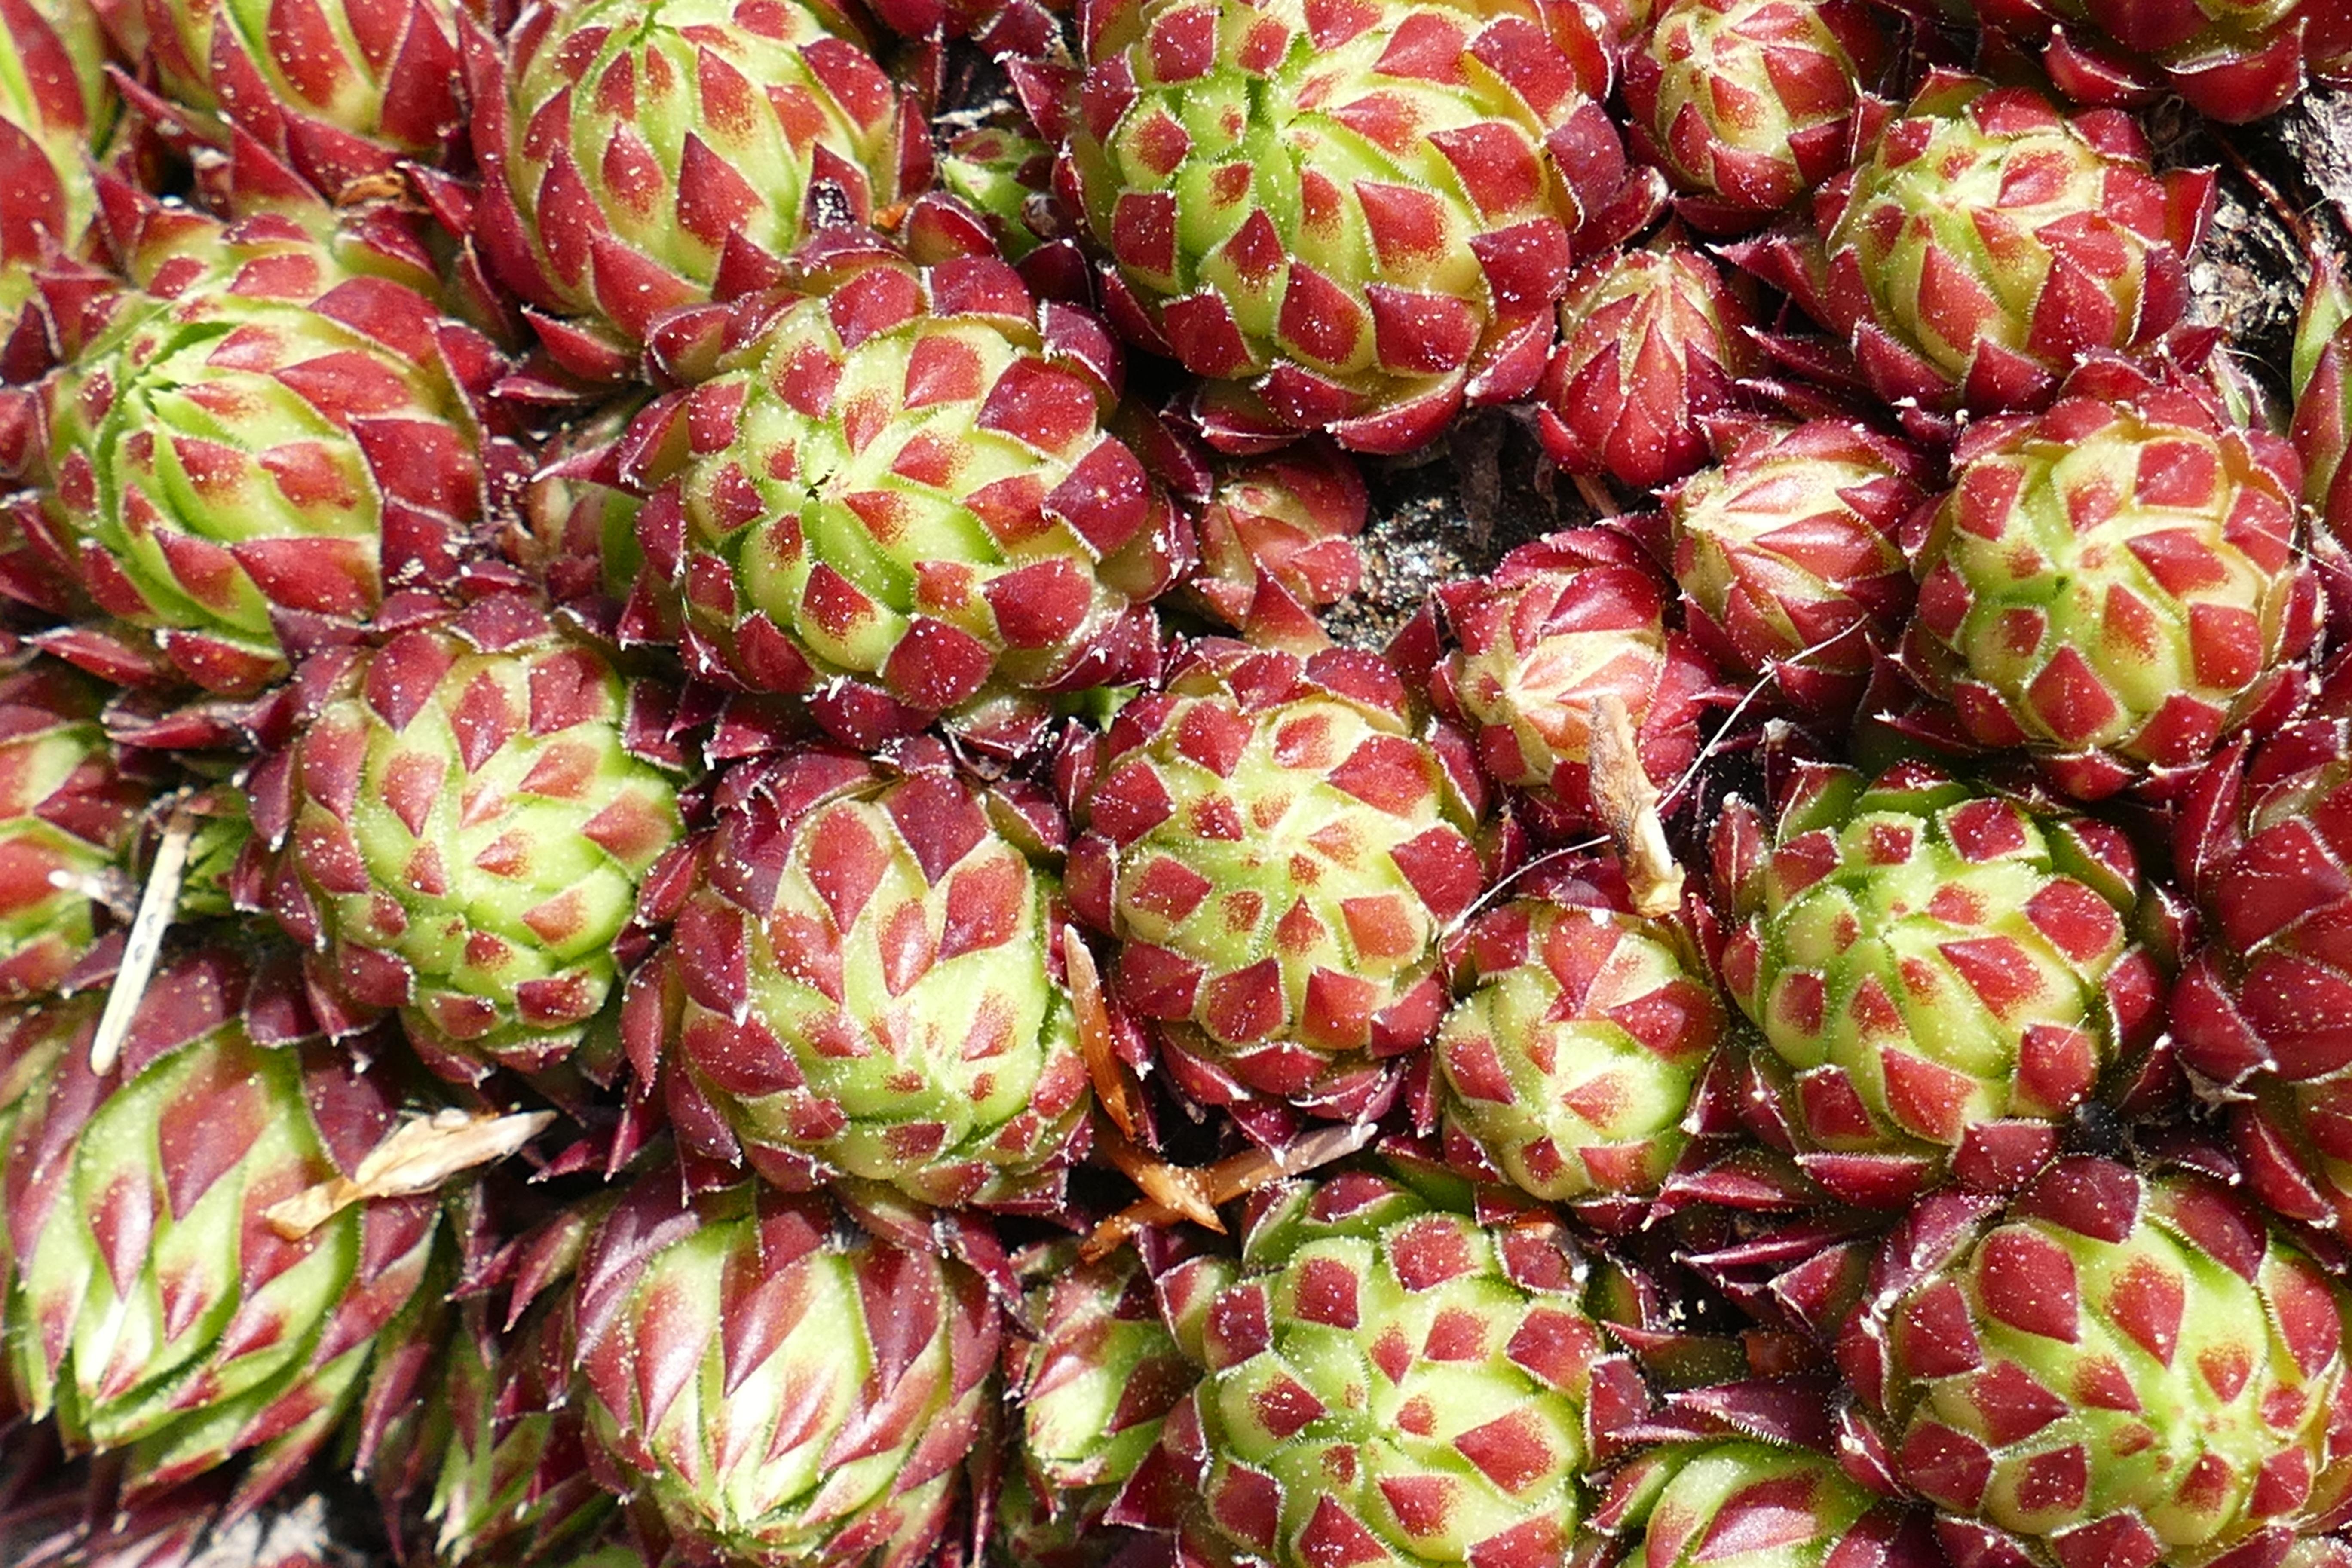 hintergrundbilder : lebensmittel, frucht, kaktus, ananas, blume